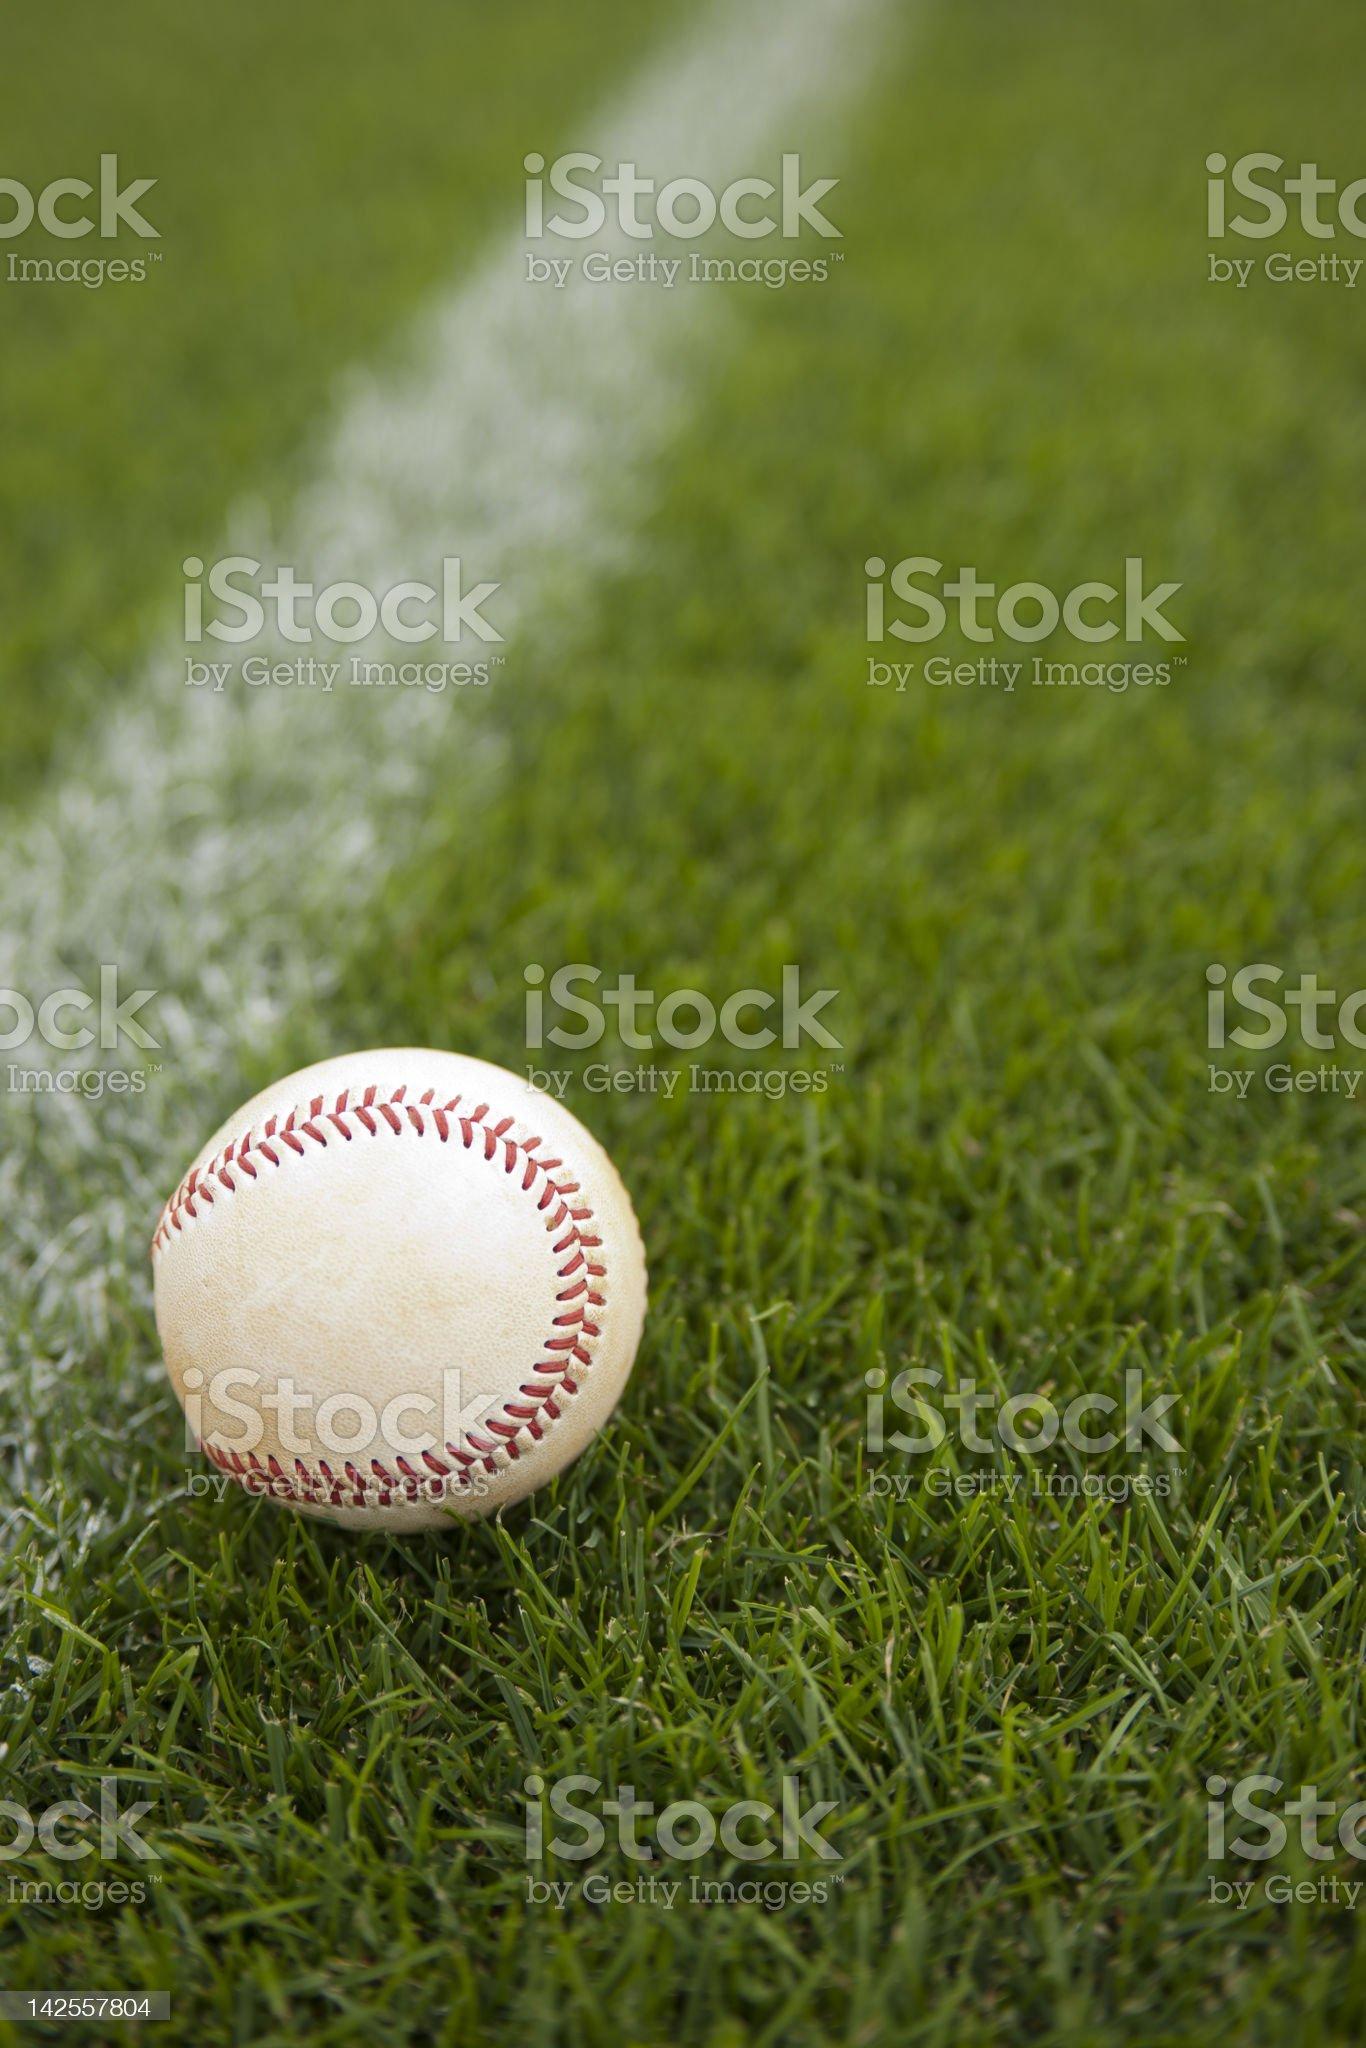 Baseball on a Baseball Field during a Baseball Game royalty-free stock photo